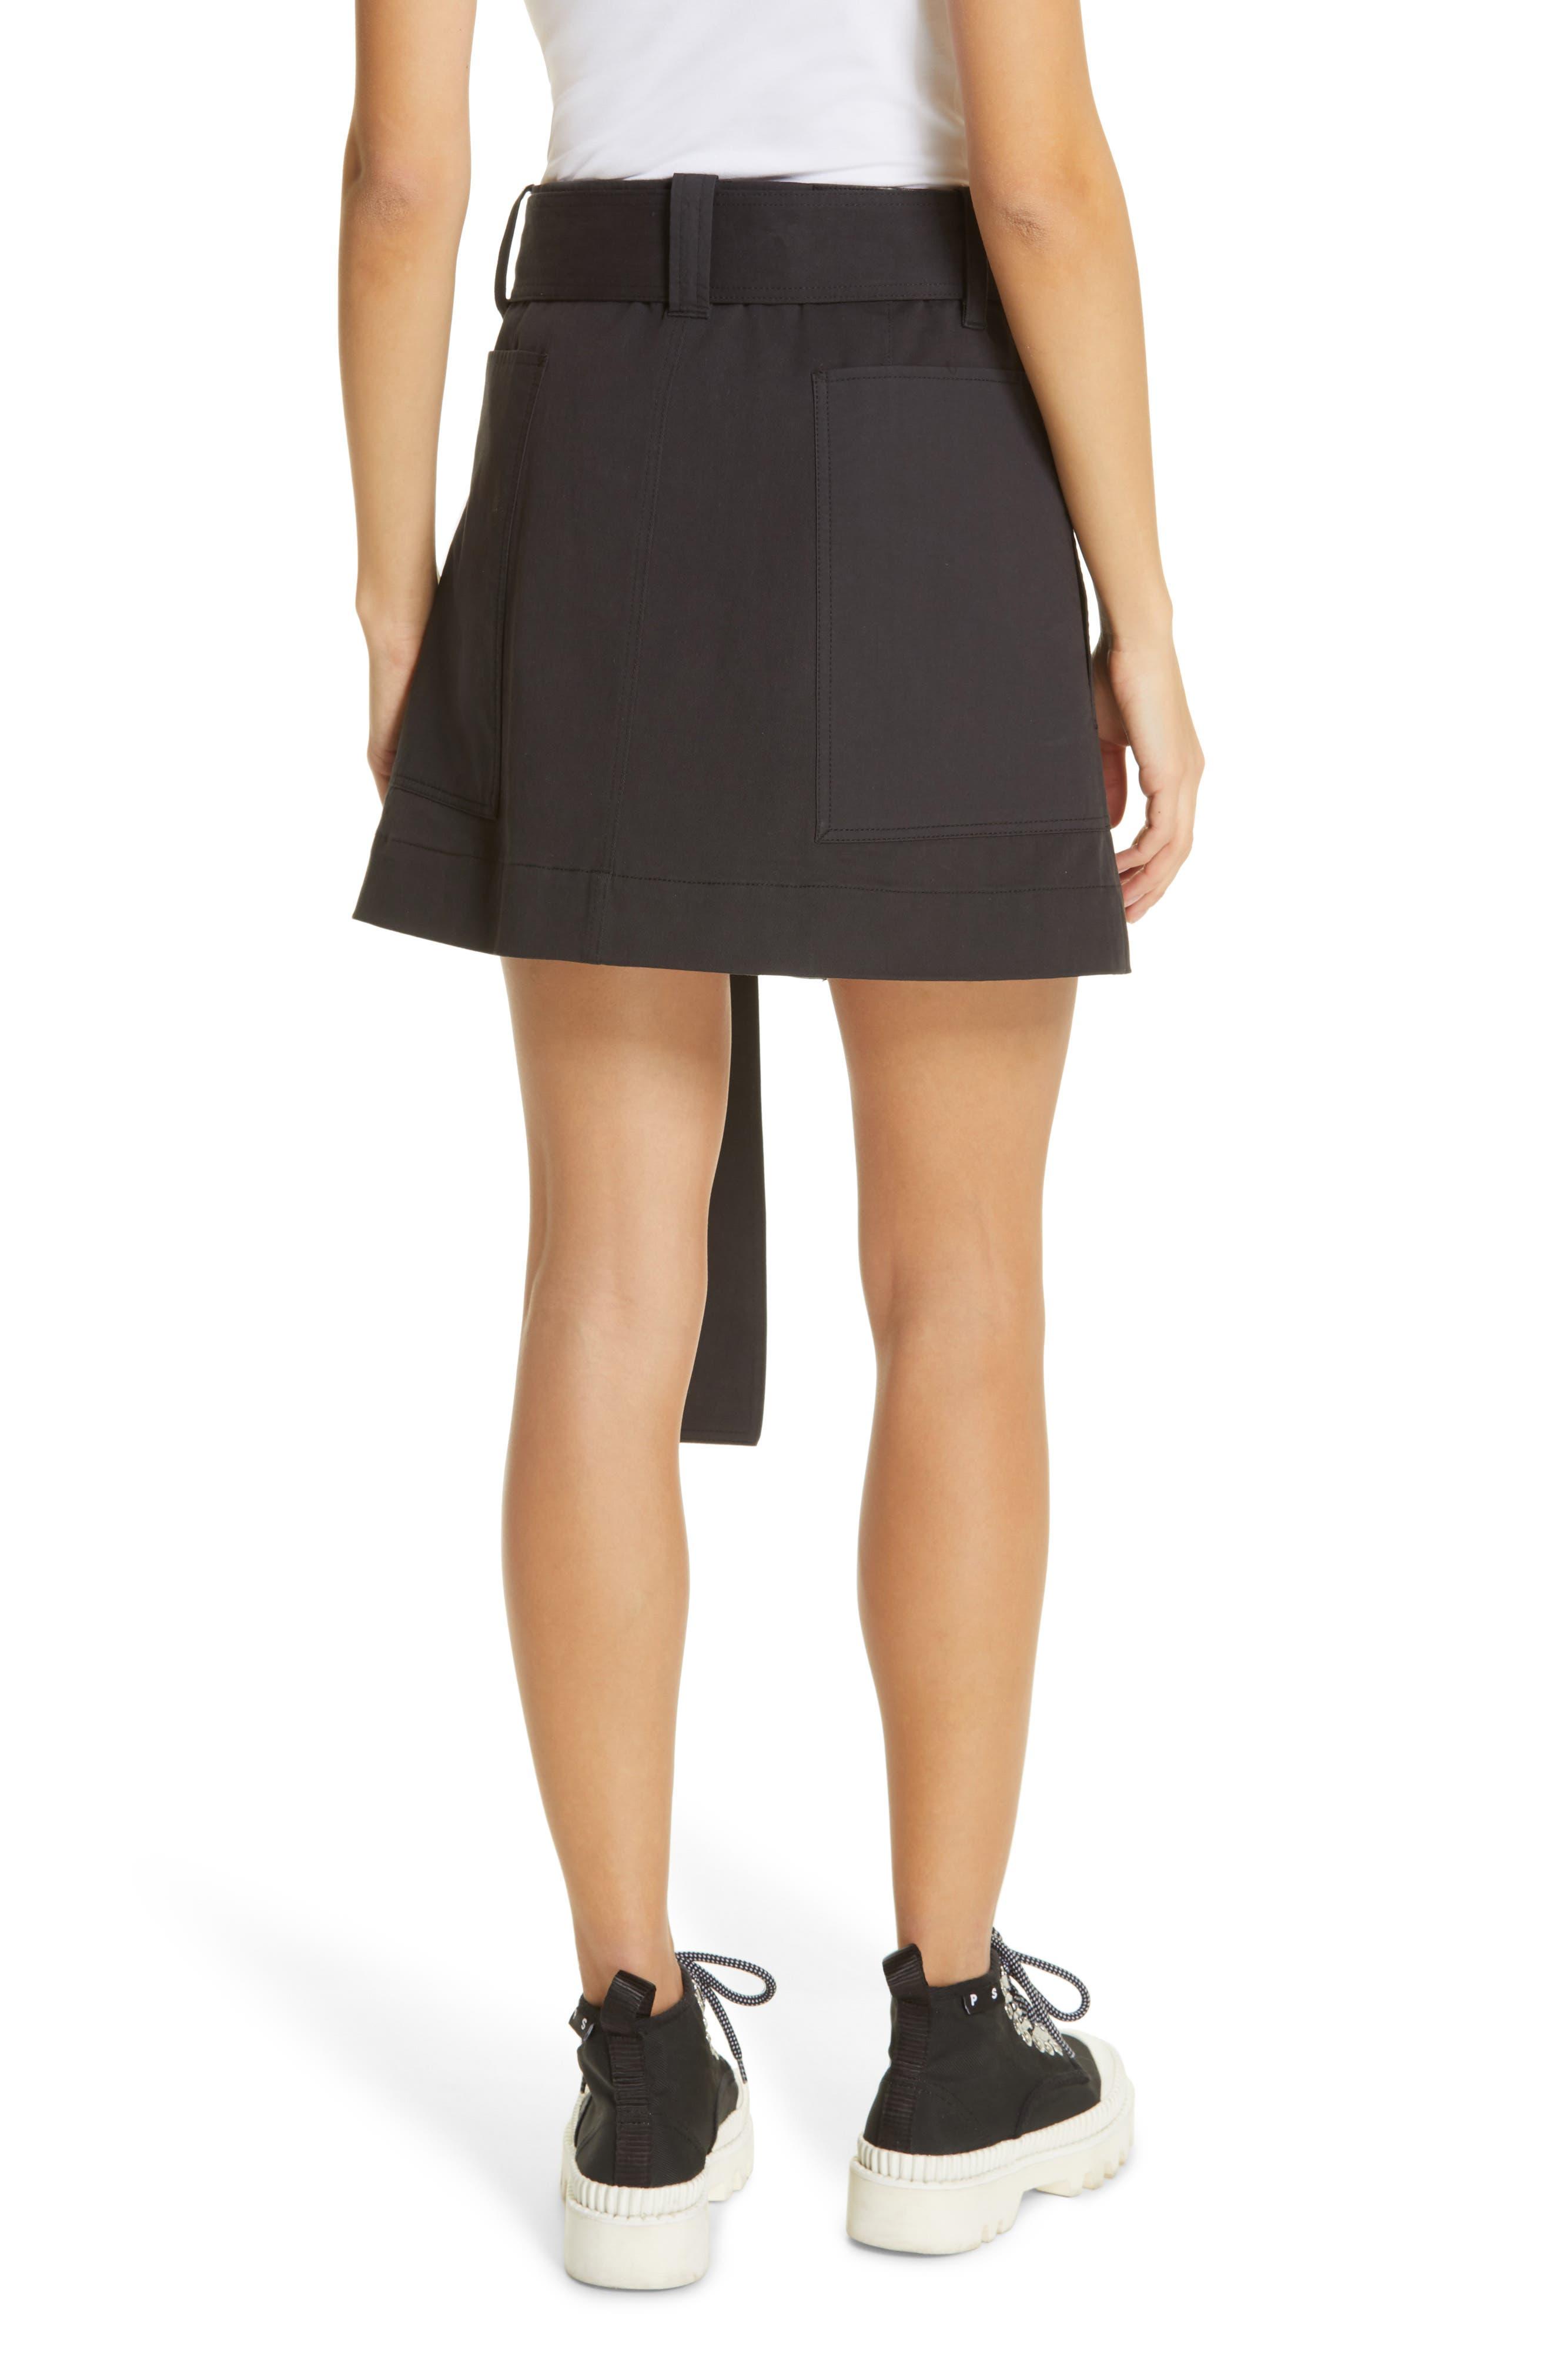 PROENZA SCHOULER, PSWL Belted Utility Skirt, Alternate thumbnail 2, color, BLACK